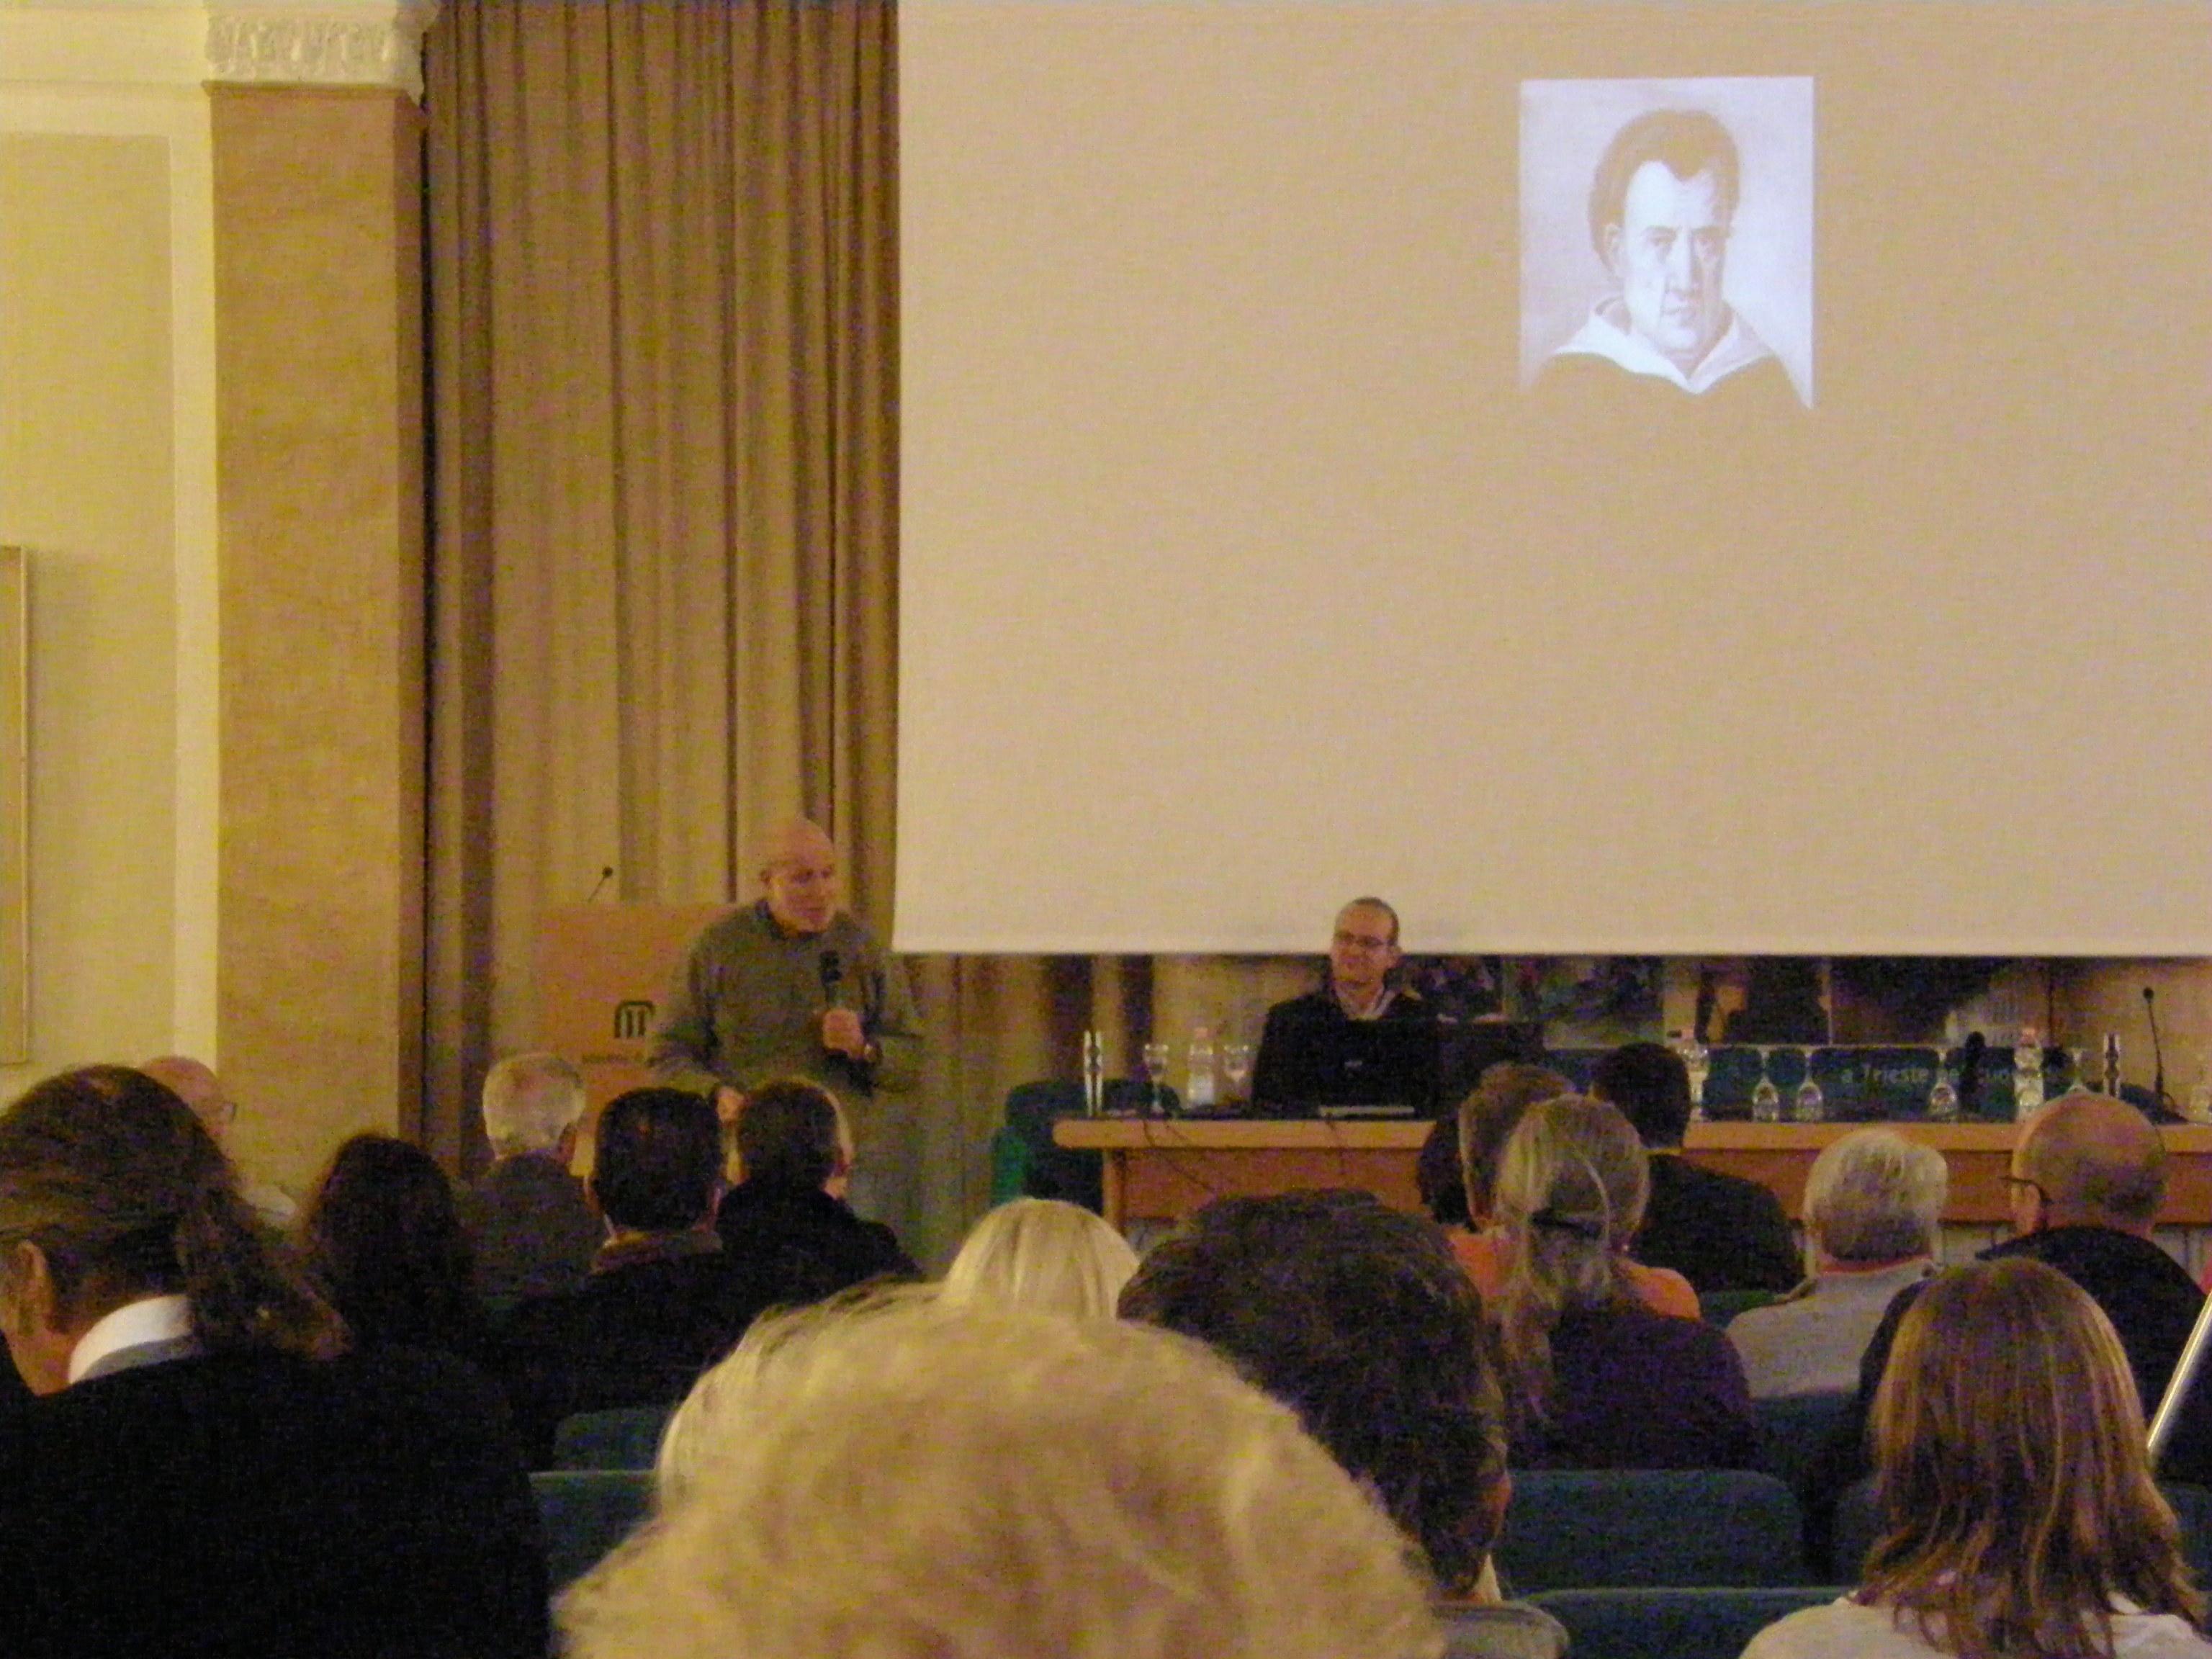 Robert Bauval e Sandro Zicari